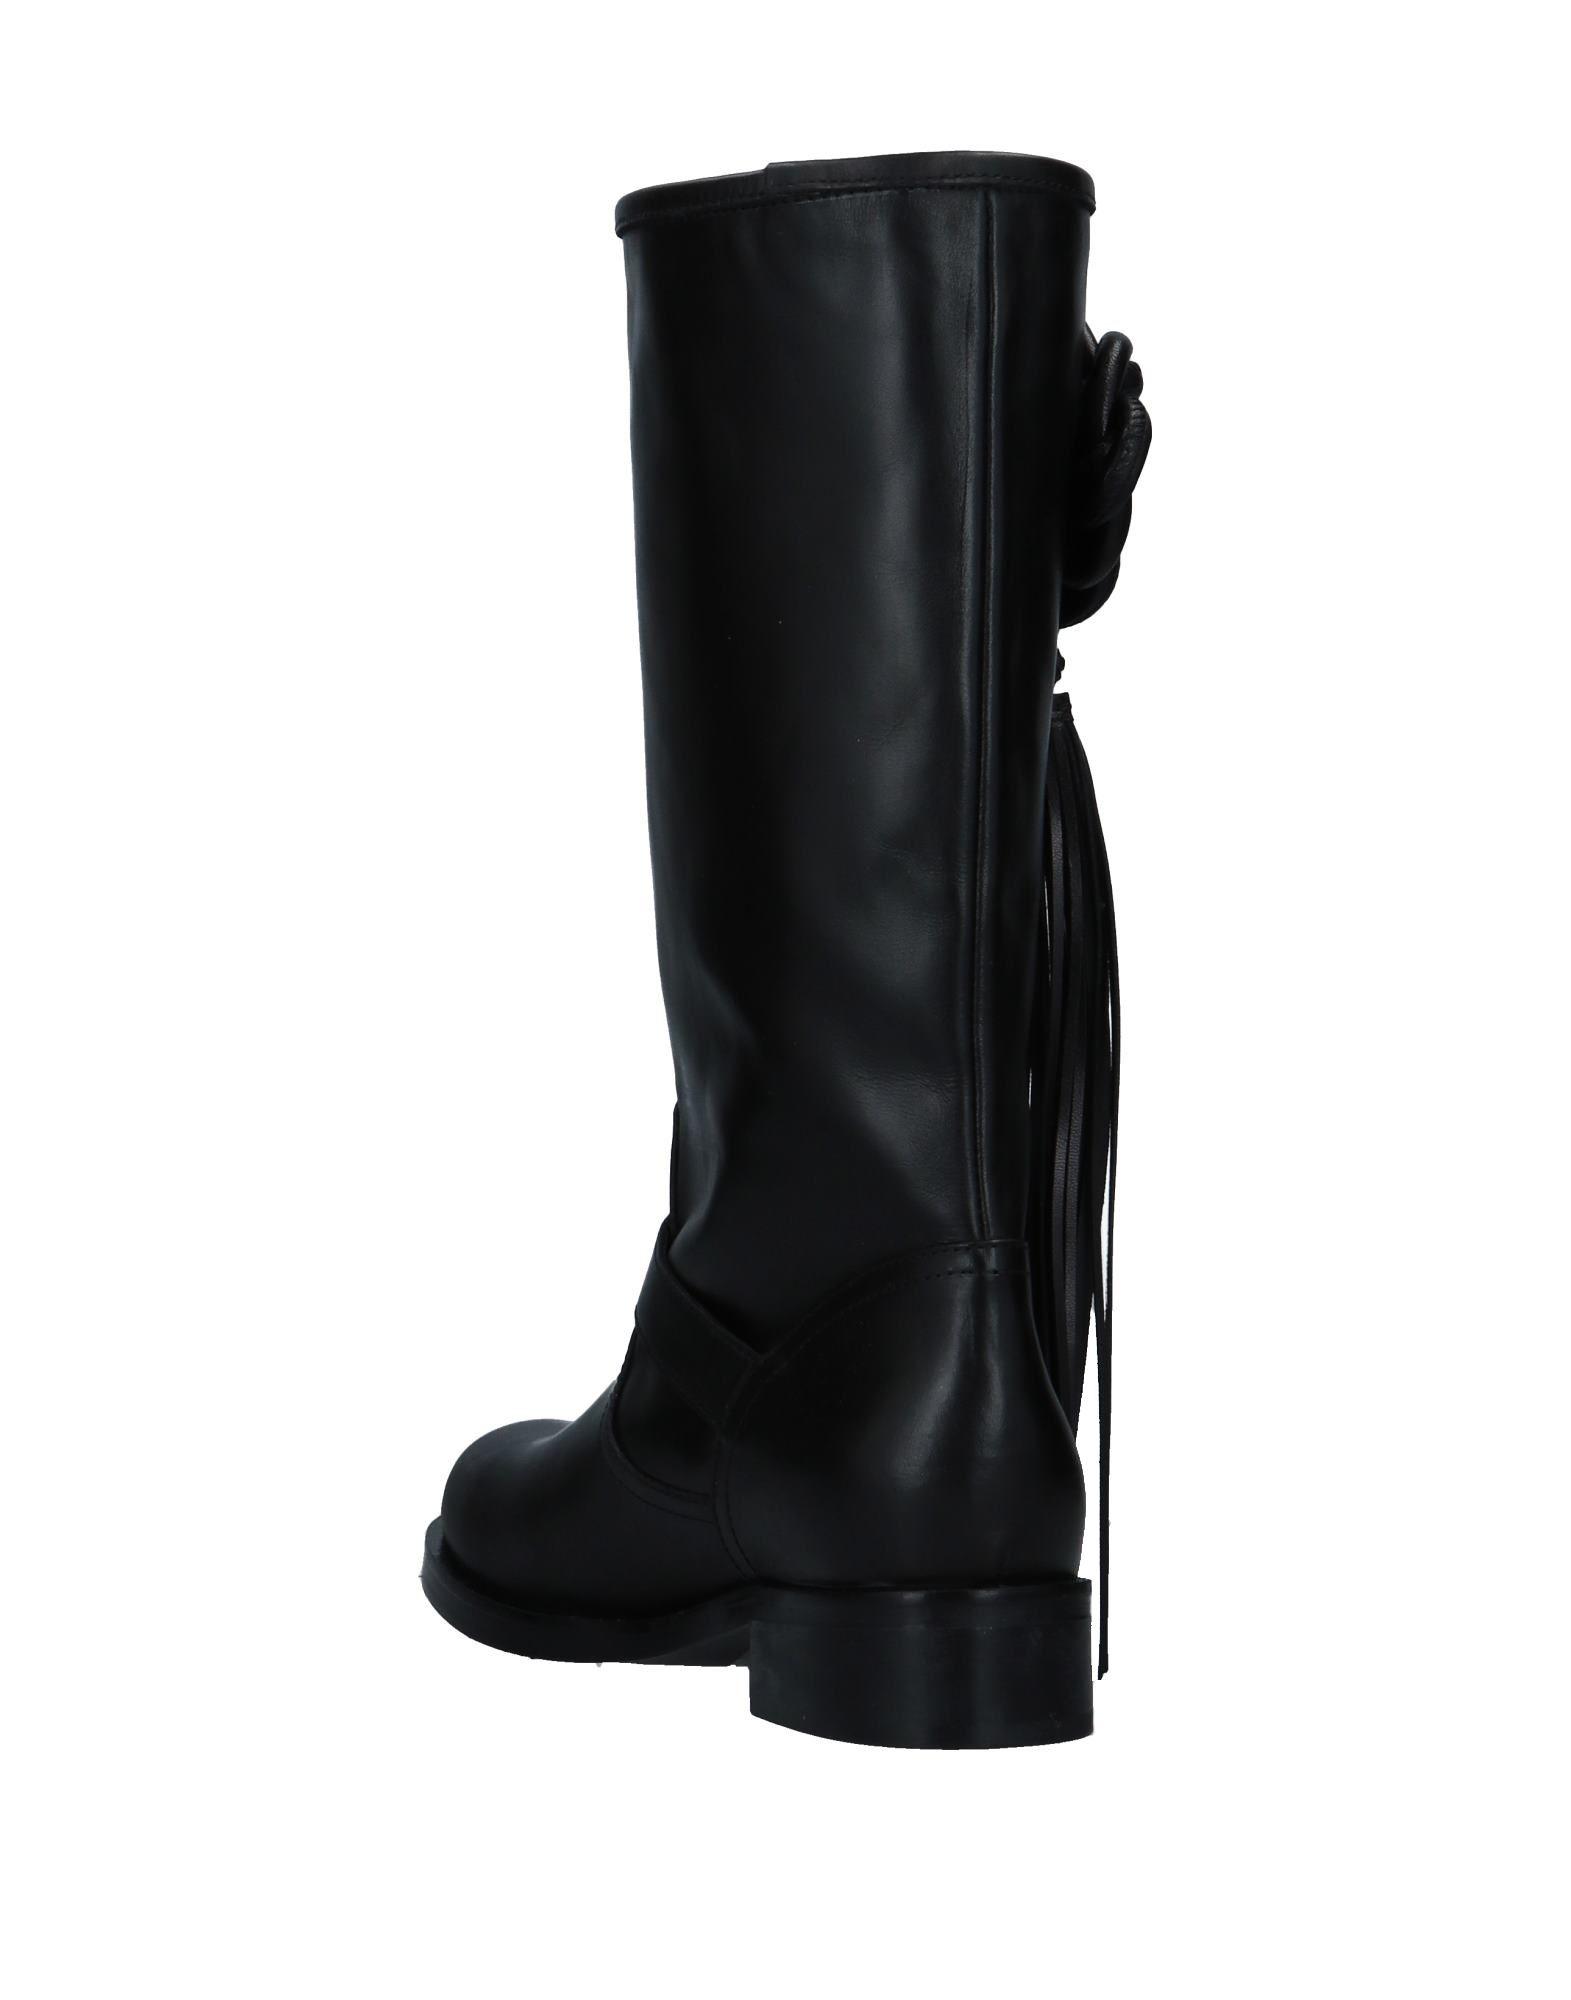 Elisabetta Franchi Neue Stiefel Damen  11541309GX Neue Franchi Schuhe 2eb227